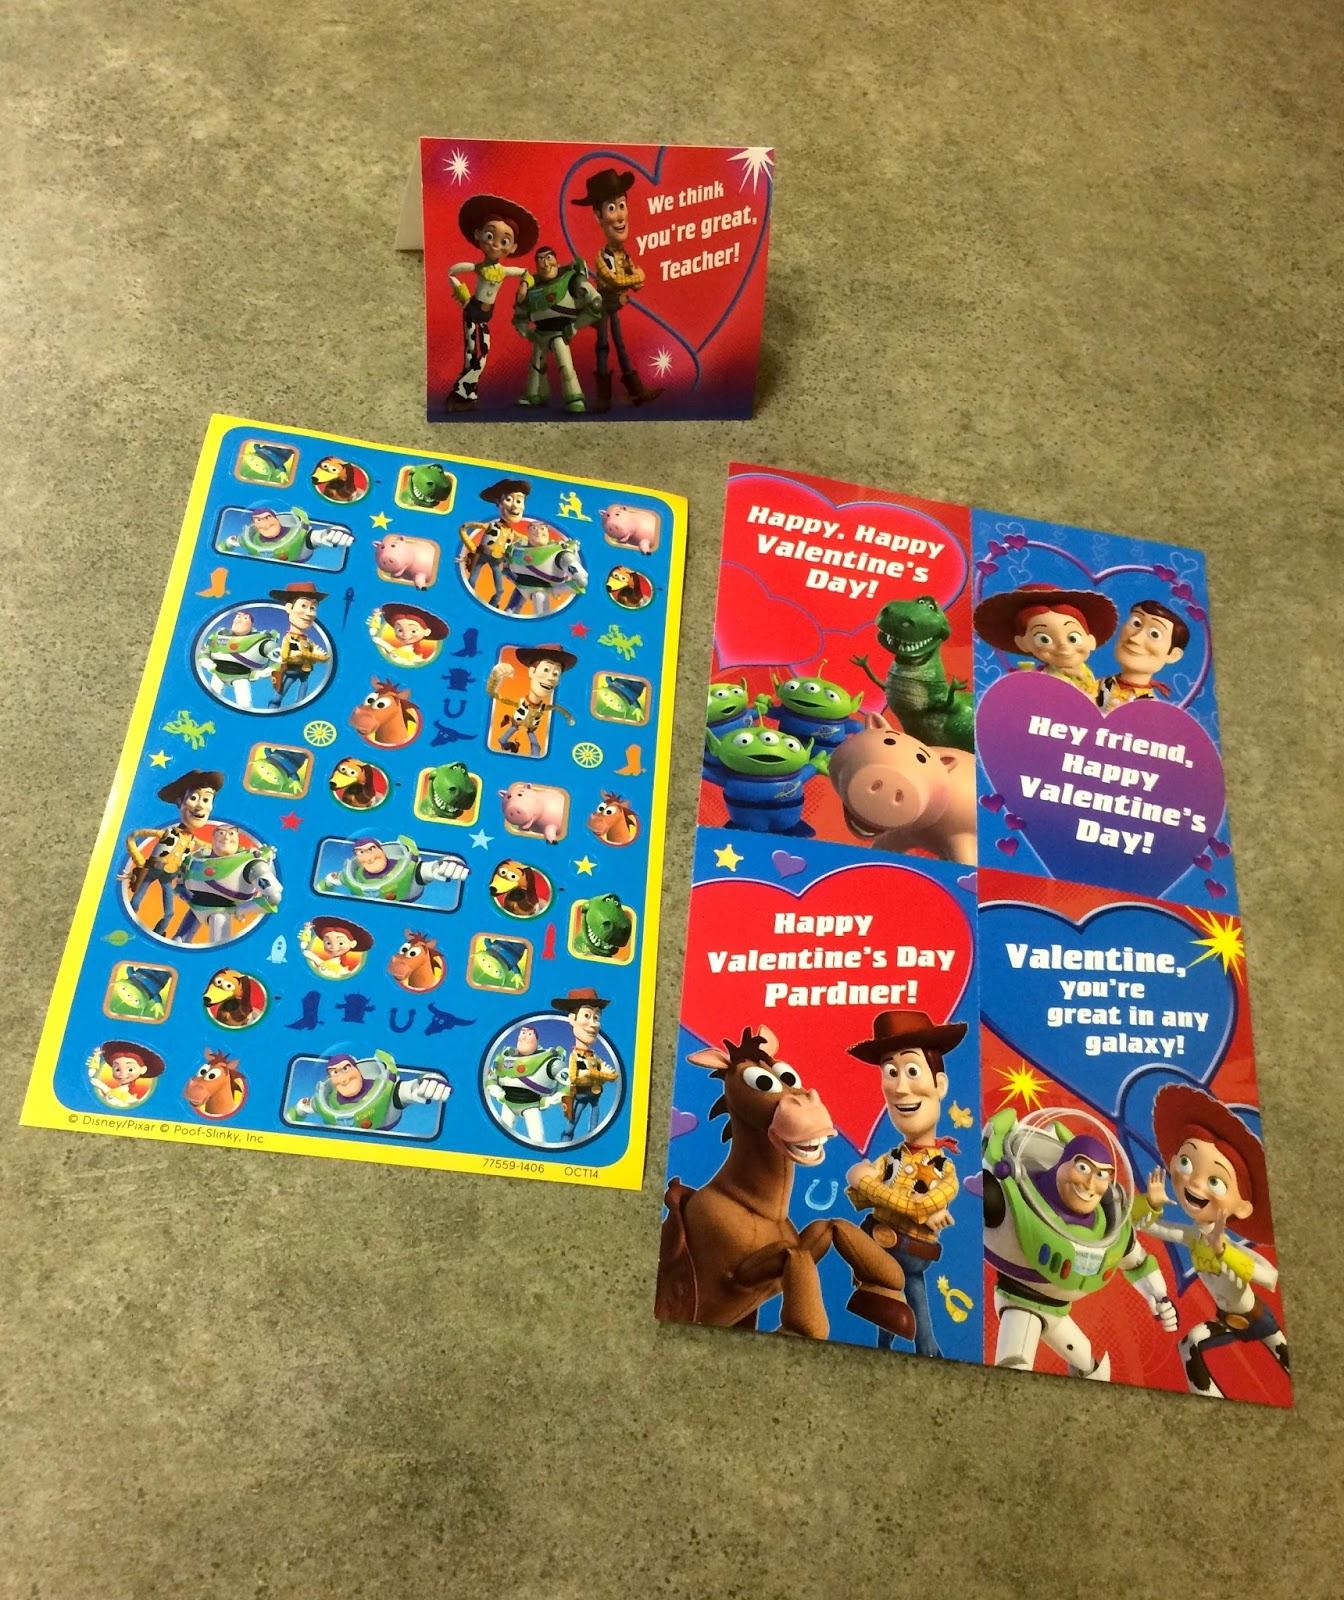 Dan The Pixar Fan Toy Story Hallmark Valentines